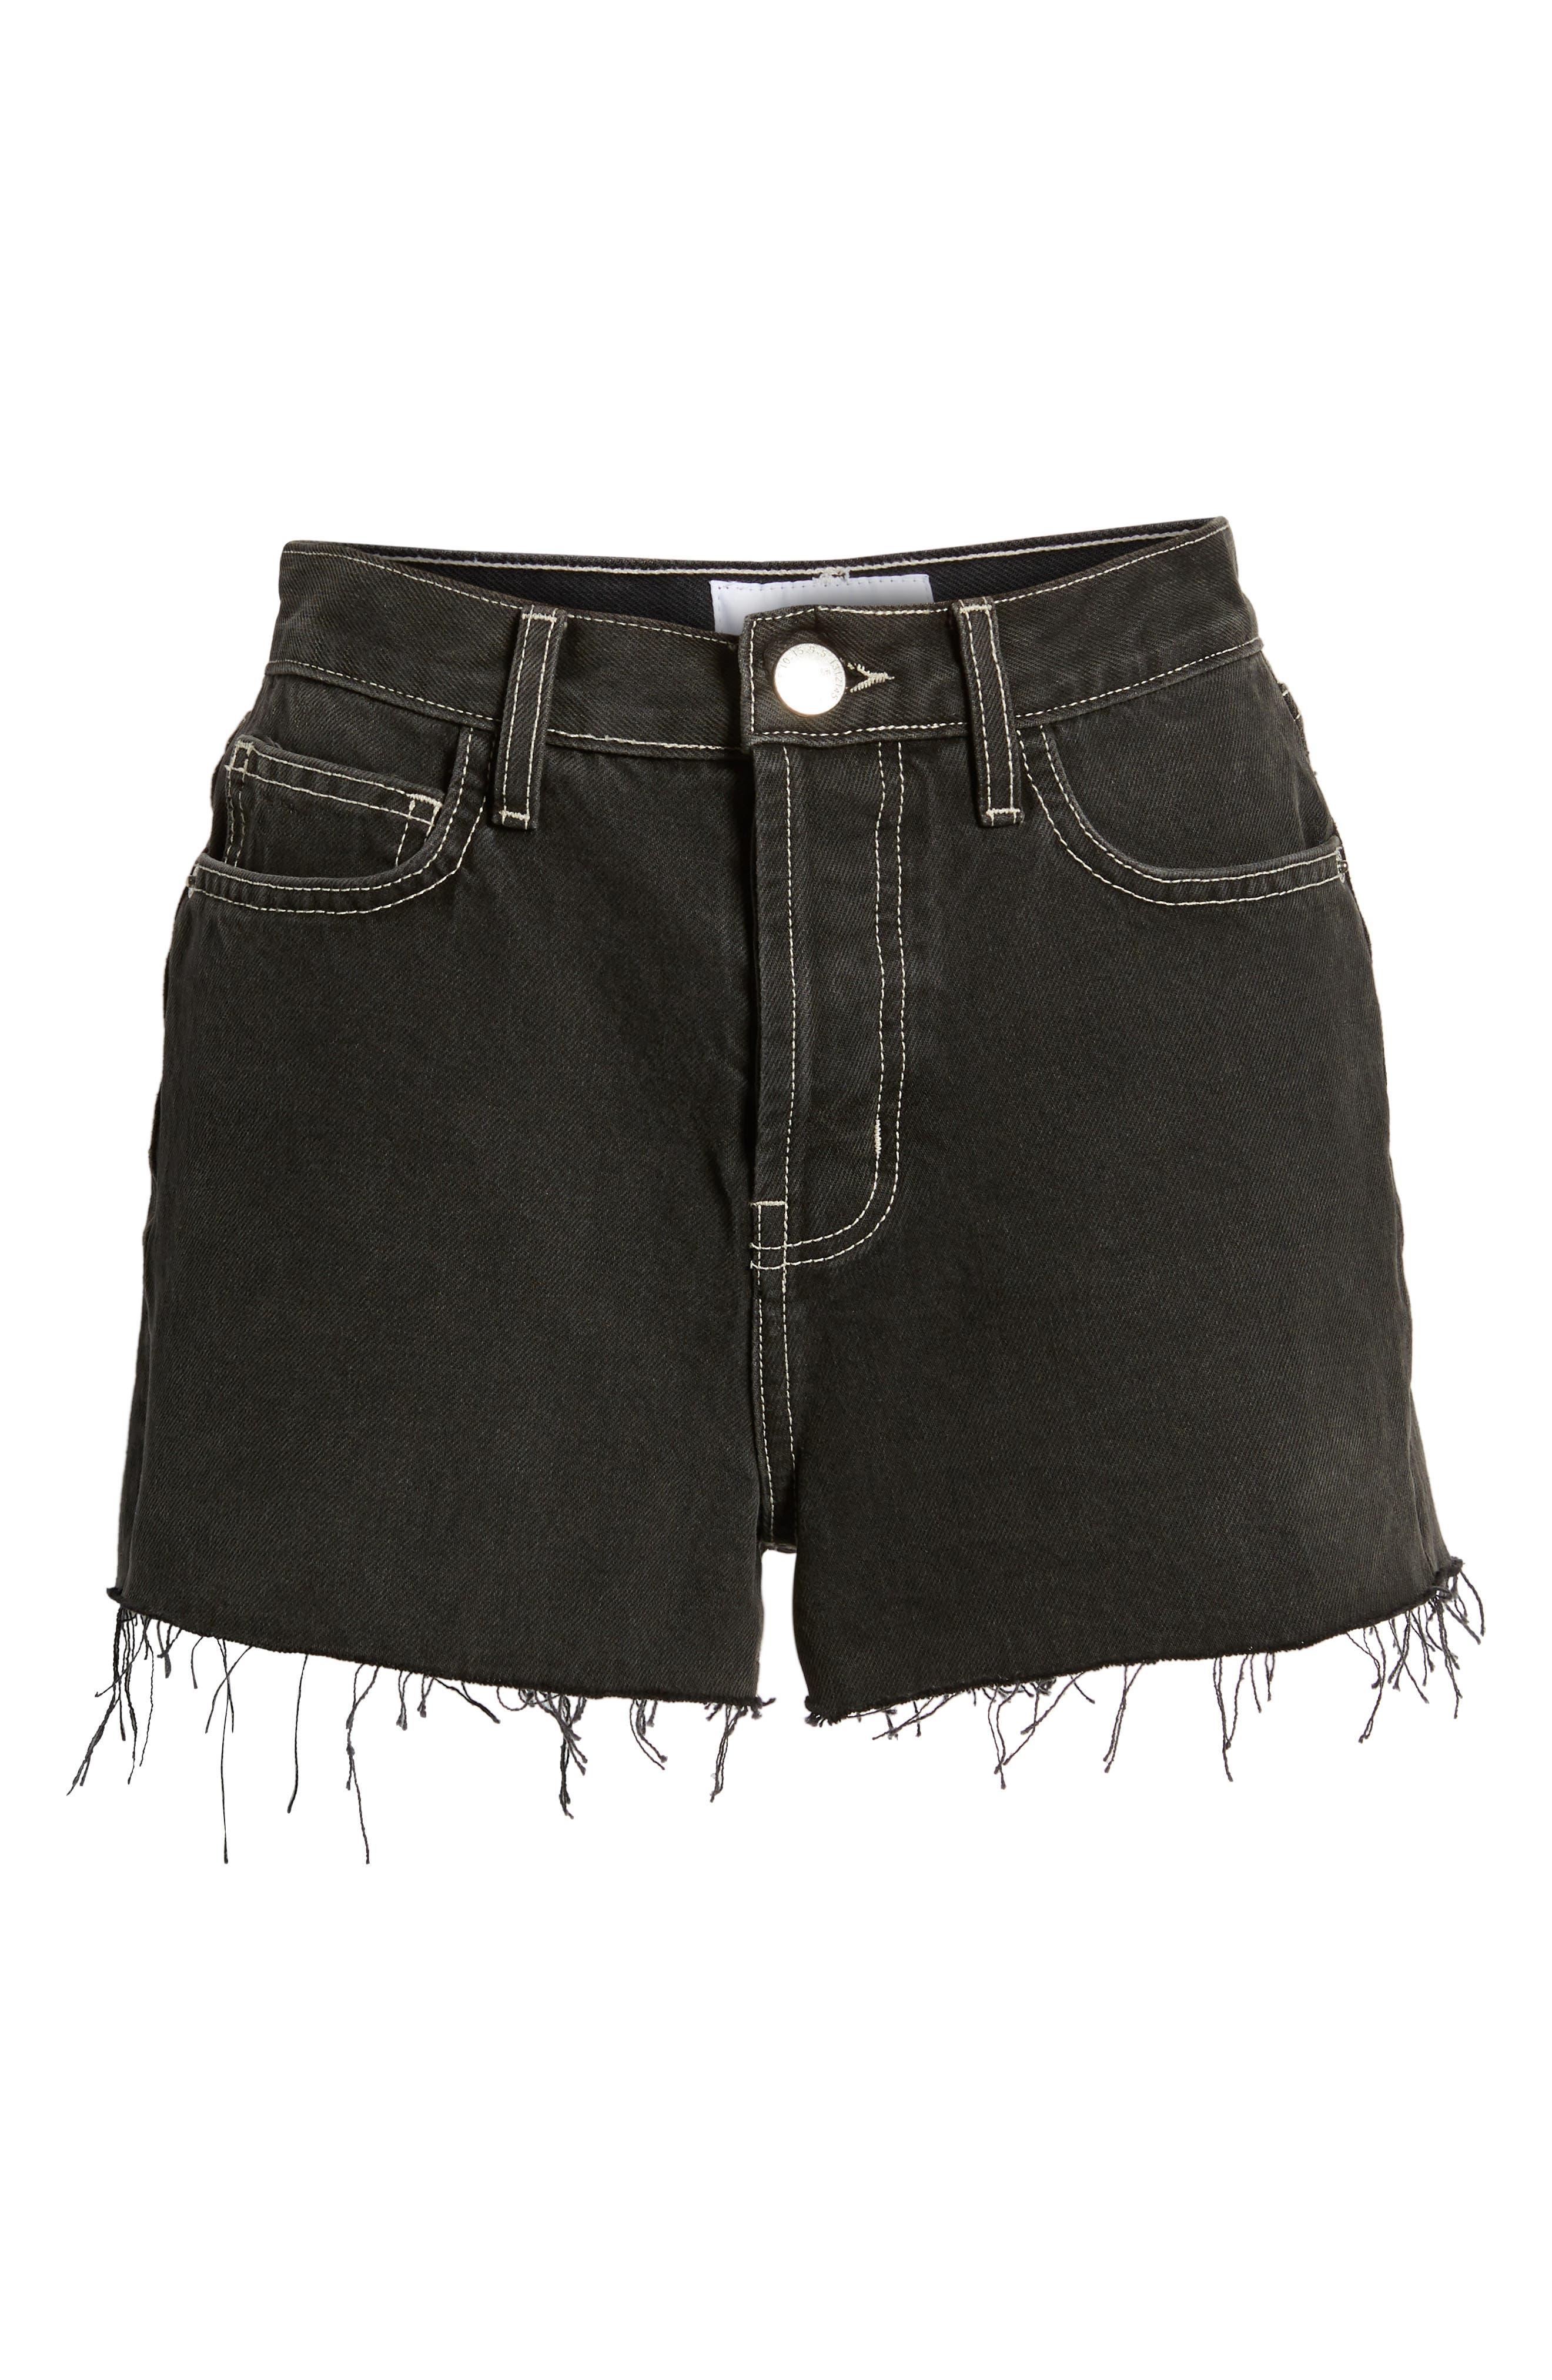 The Ultra High Waist Denim Shorts,                             Alternate thumbnail 7, color,                             006